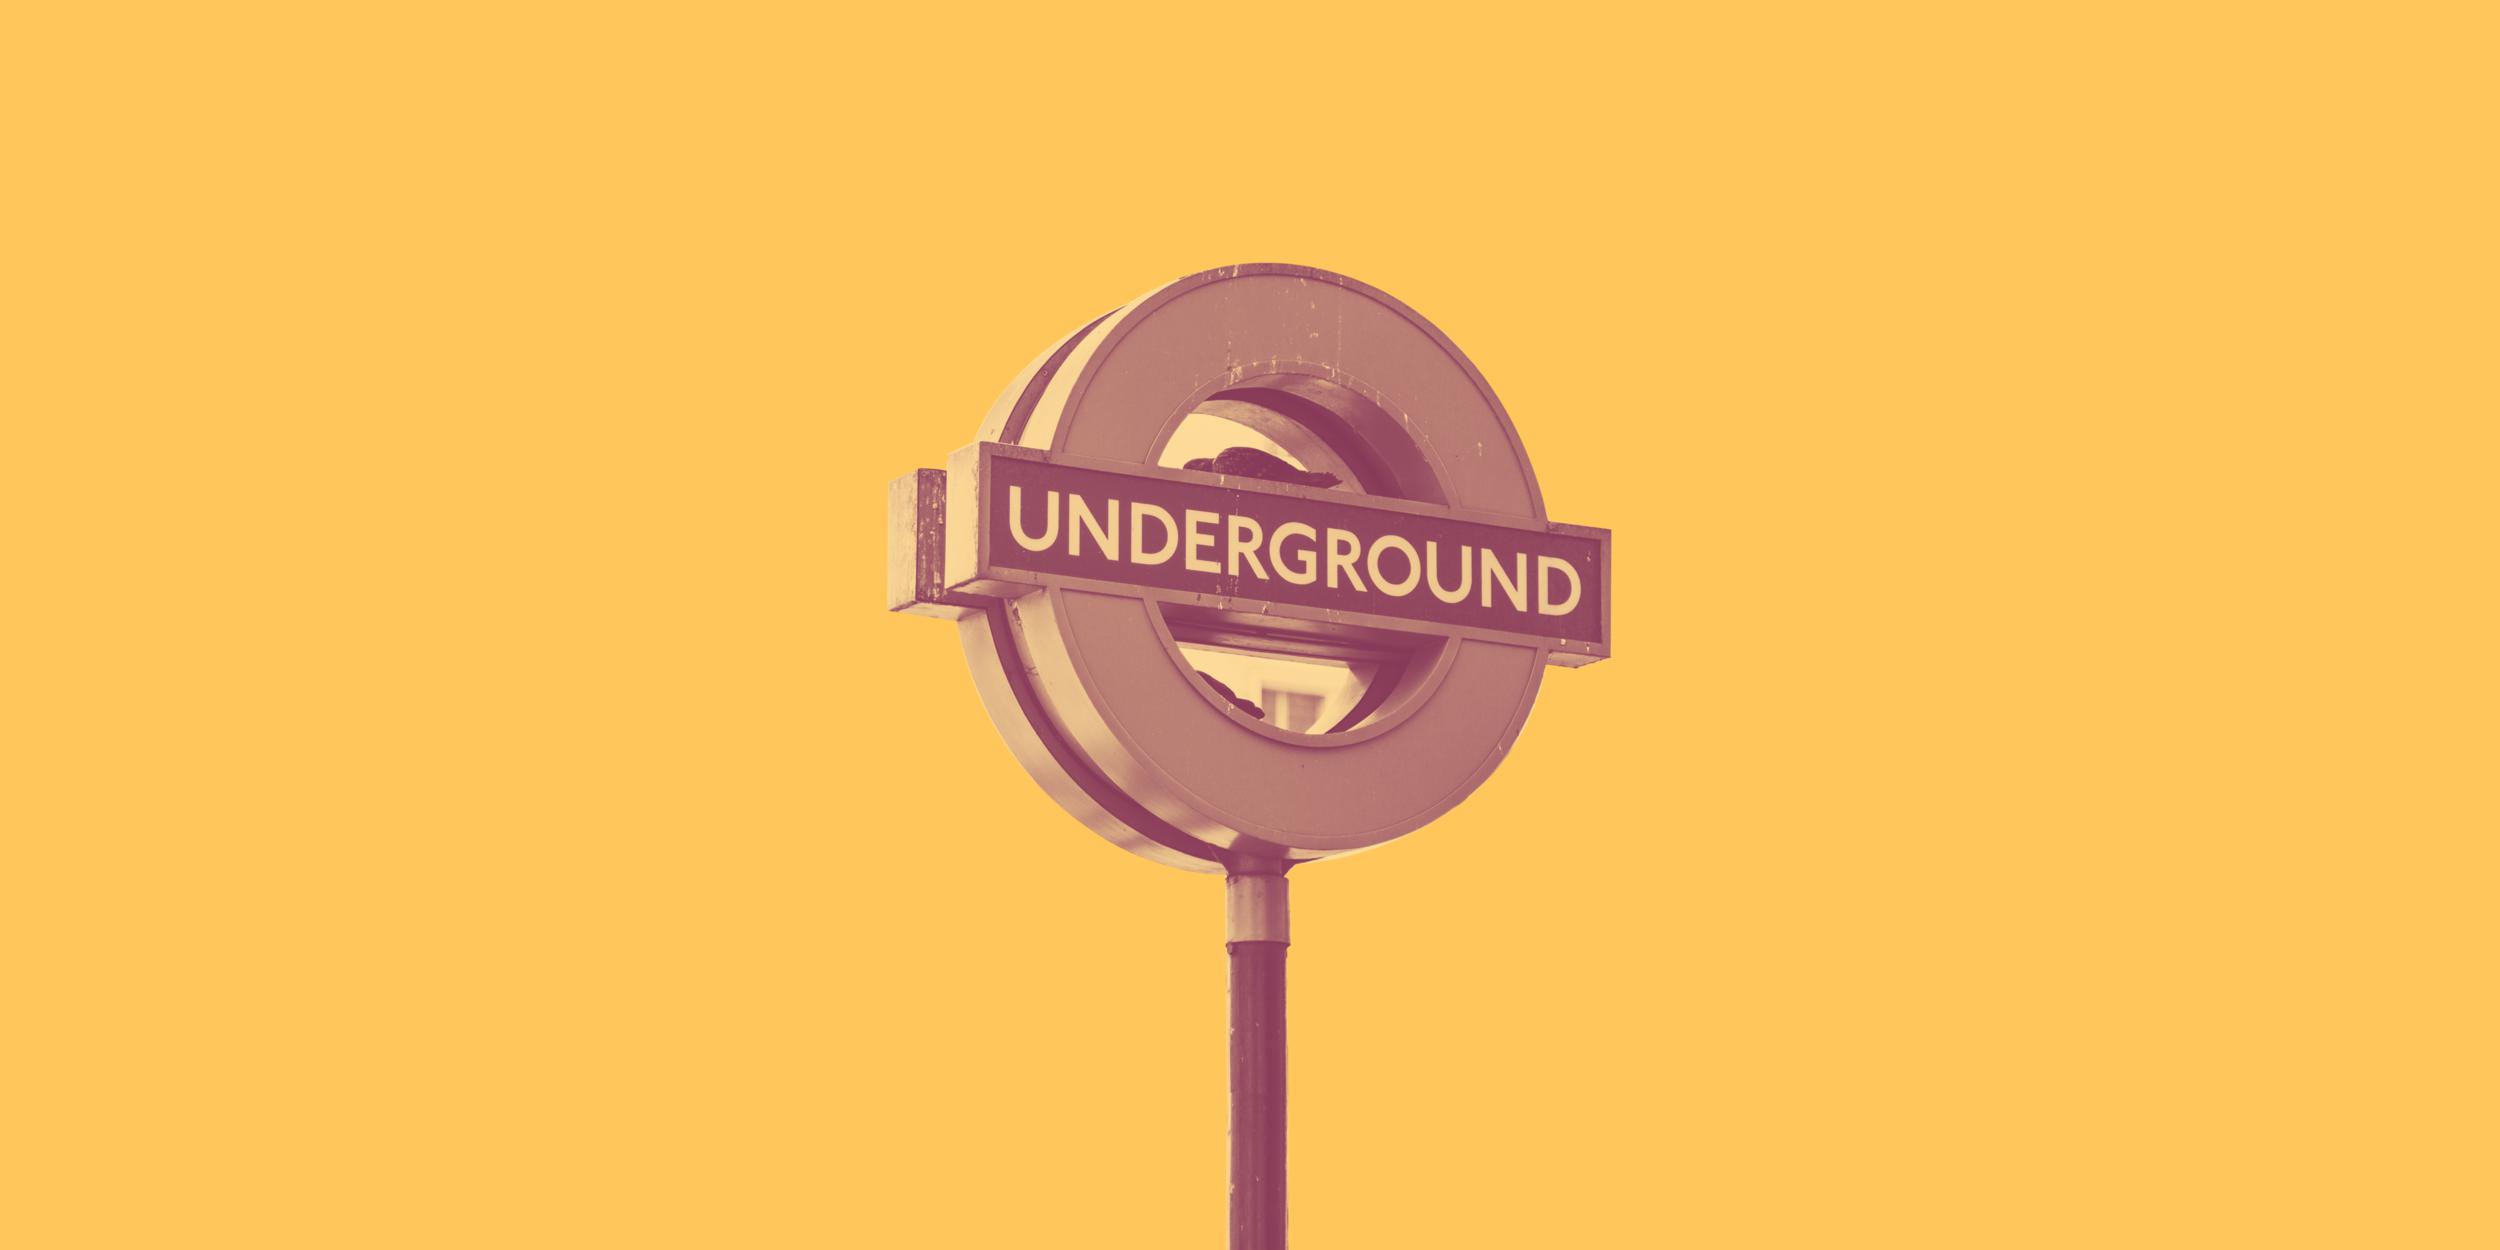 eugen_esanu_laroche_ui_design_london_underground.png